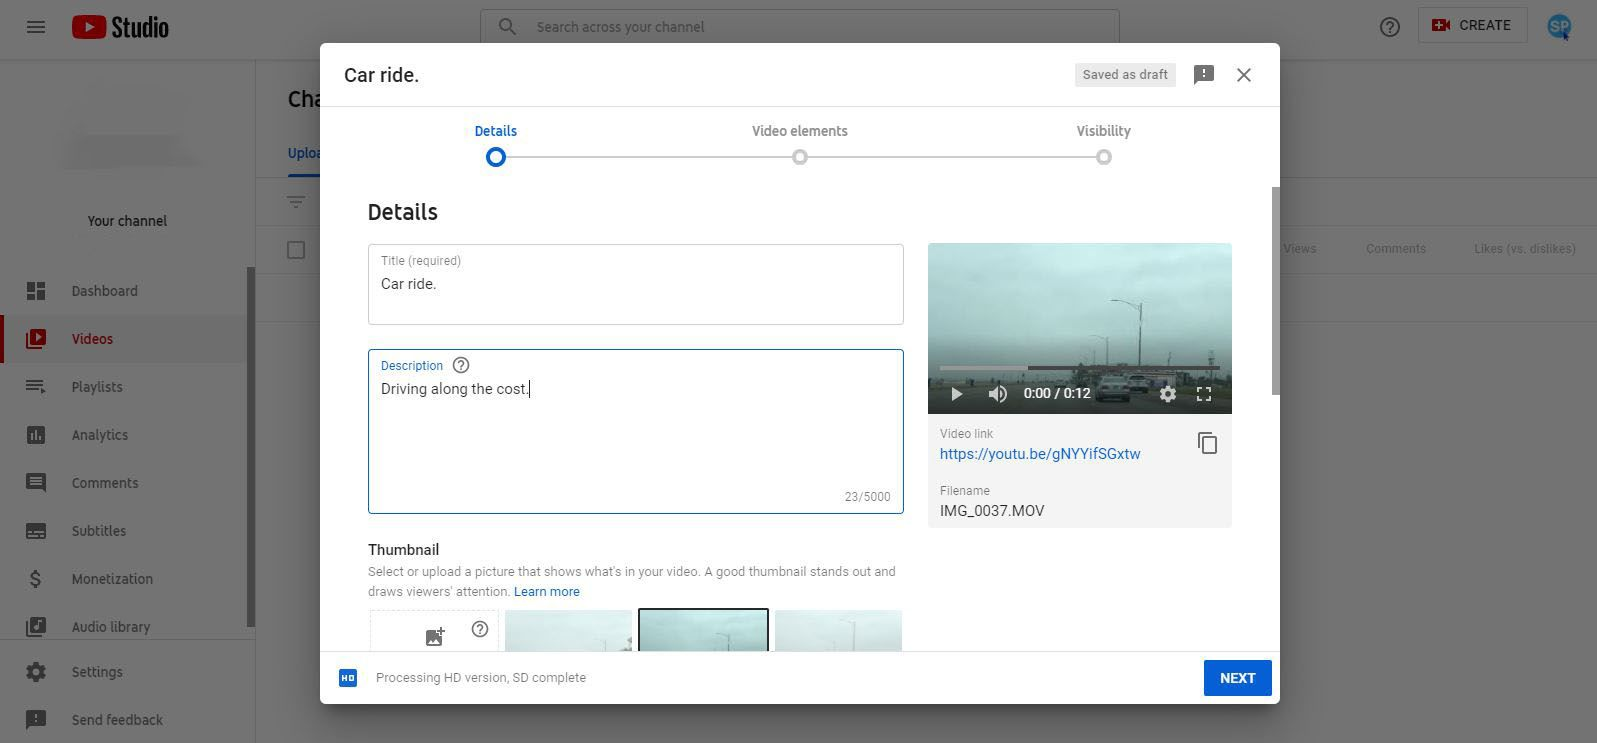 YouTube Studio - enter video details